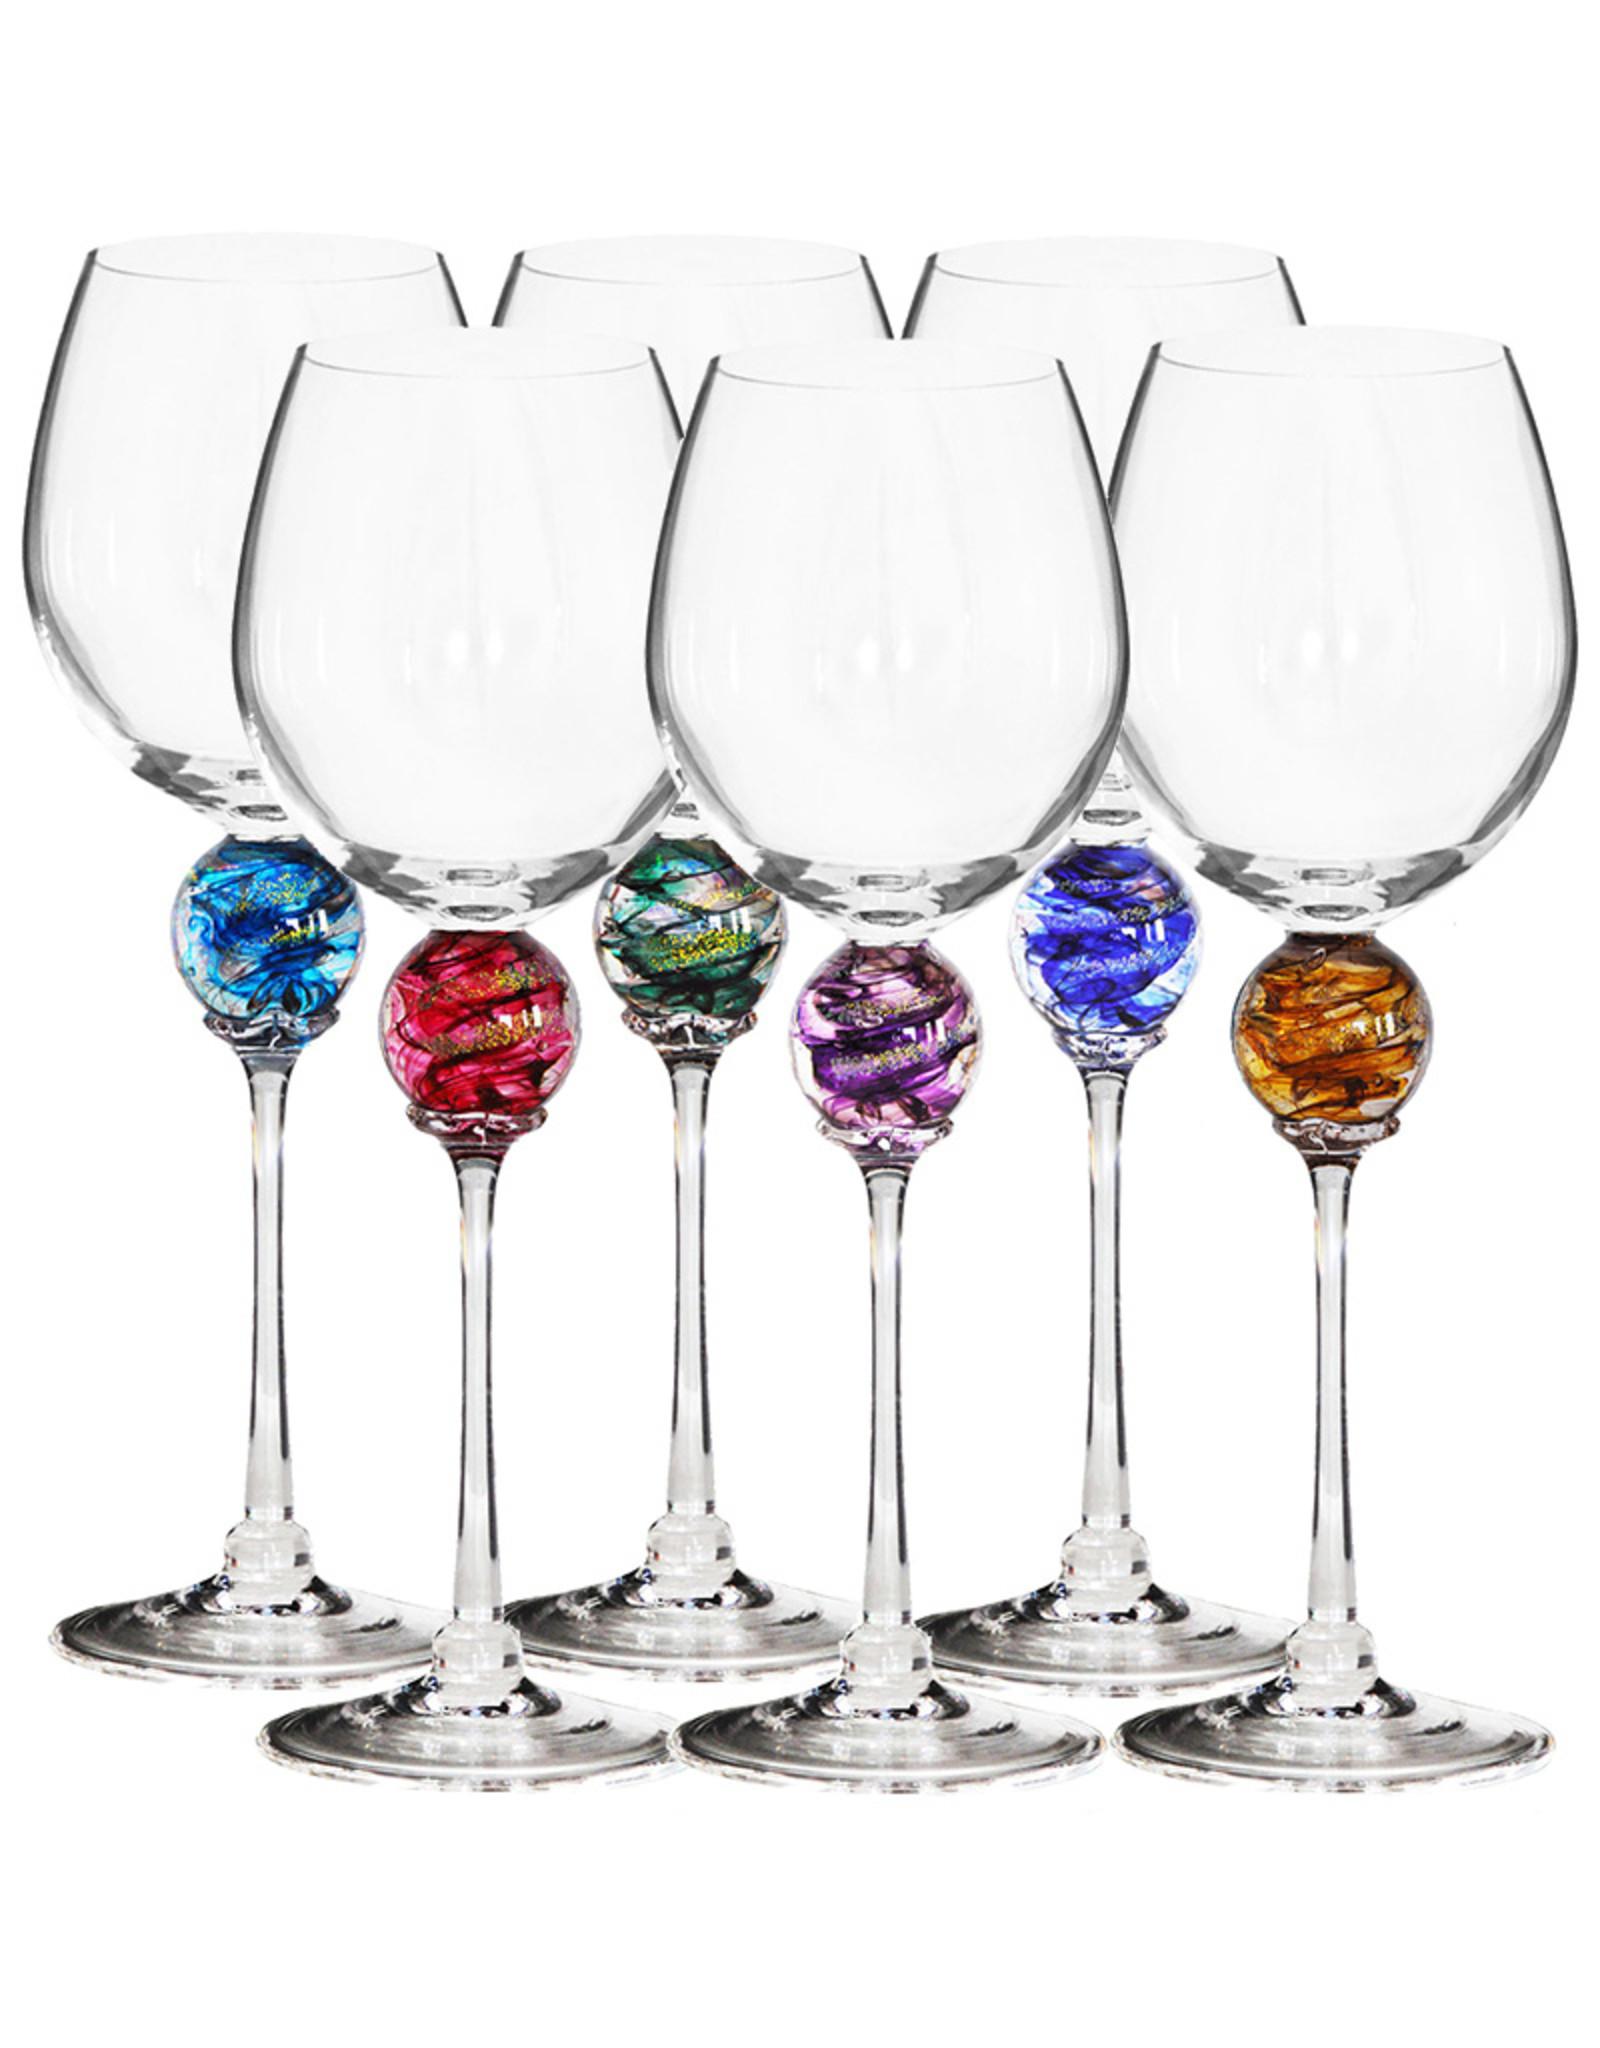 ROMEO GLASS GREEN PLANET WINE GLASS